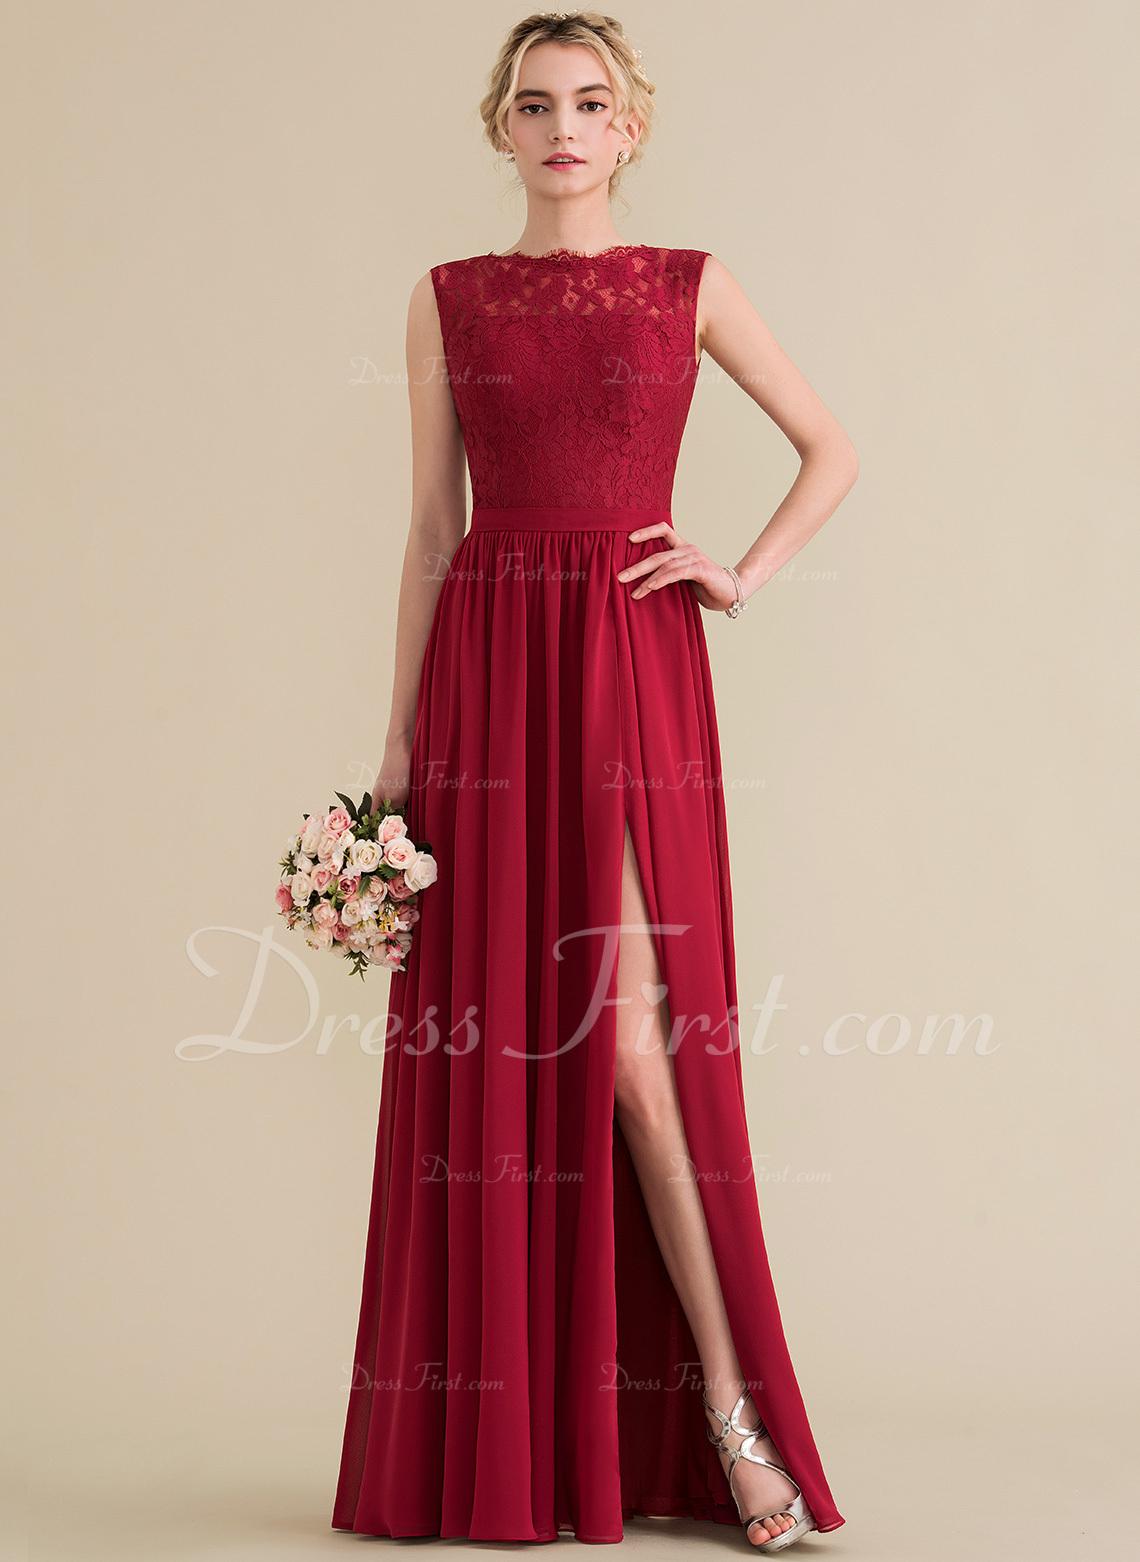 5968c03ec48 Loading zoom. Loading. Color  Burgundy. A-Line Princess Scoop Neck Floor-Length  Chiffon Lace Bridesmaid Dress With Split Front ...